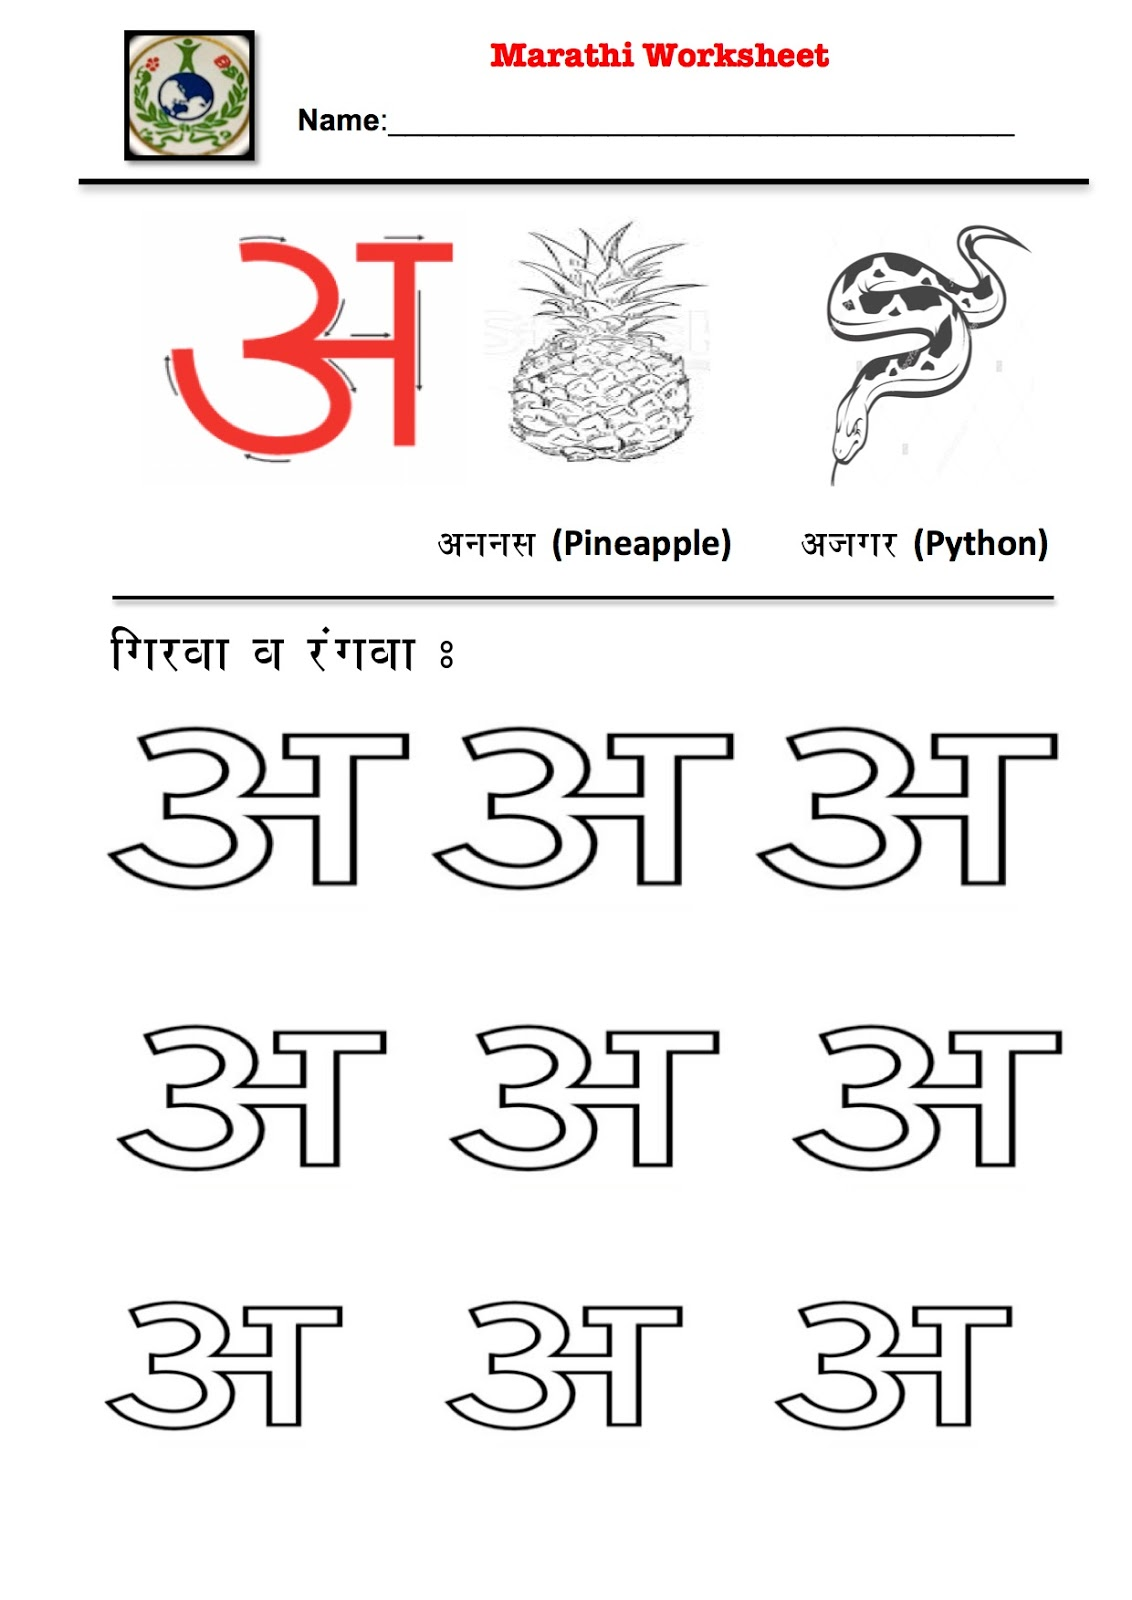 Marathi Worksheets: November 2016